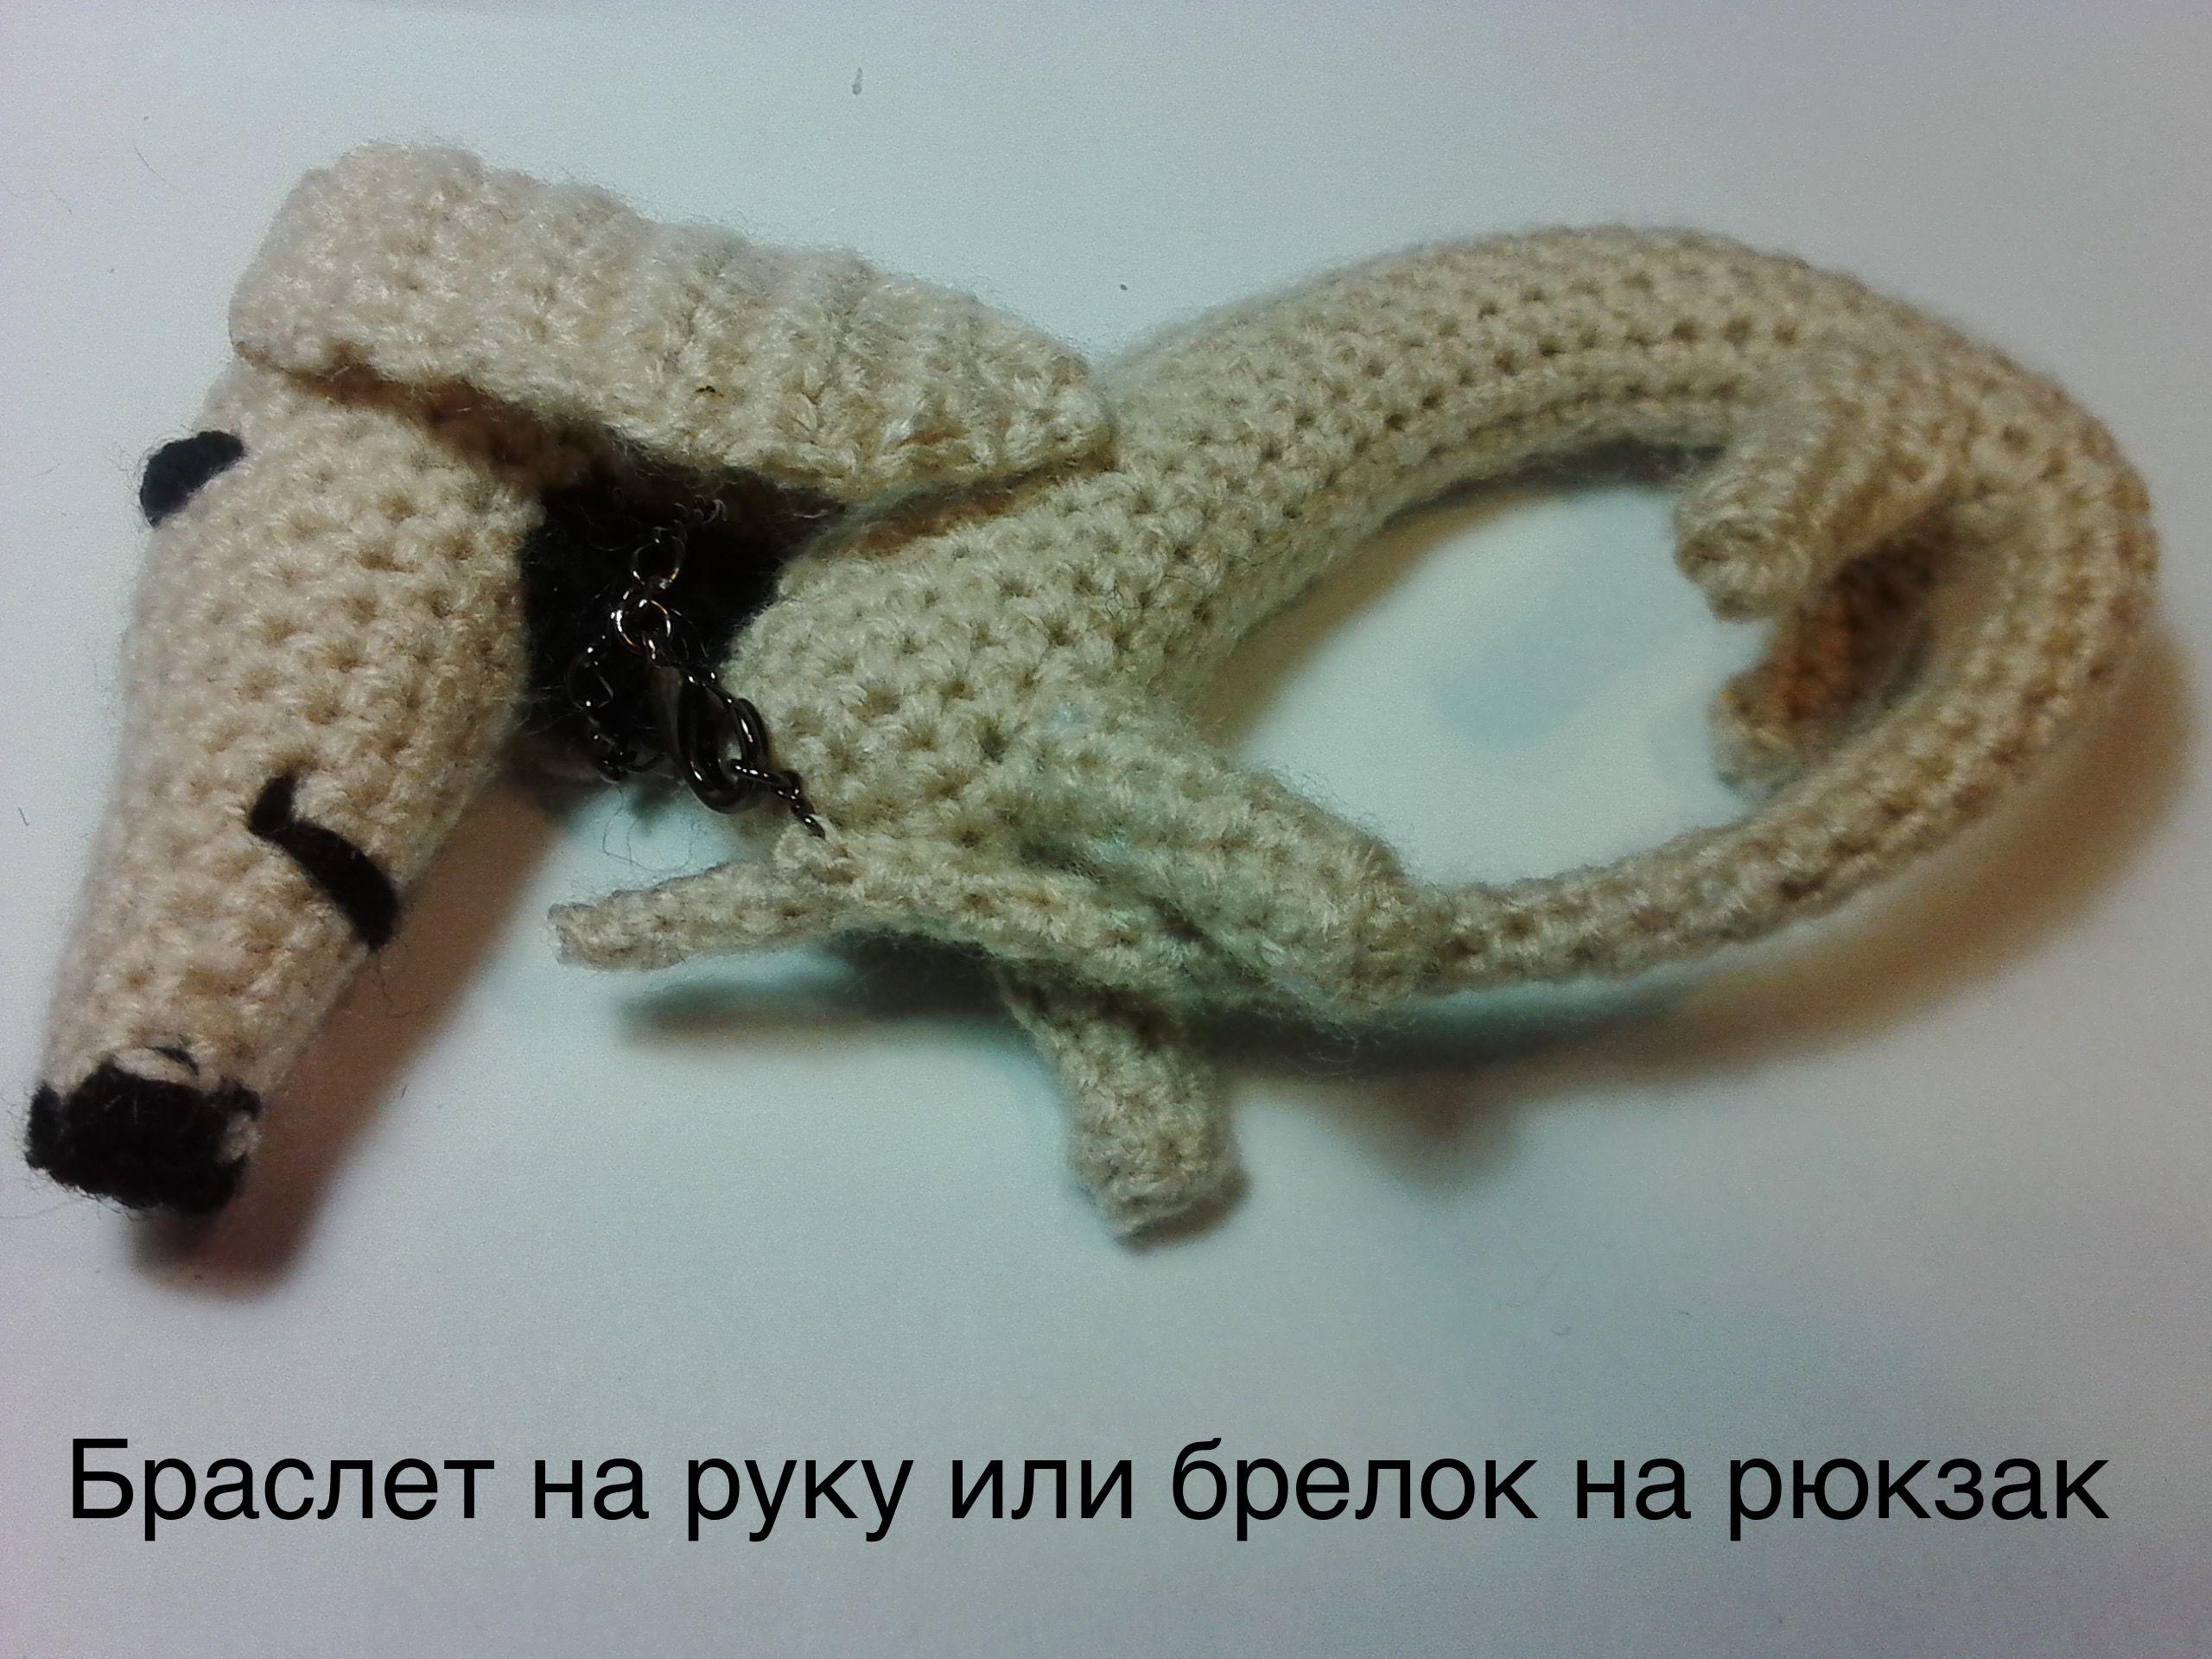 шклоа собака браслет песик талисман новогодний брелок сувенир щенок такса